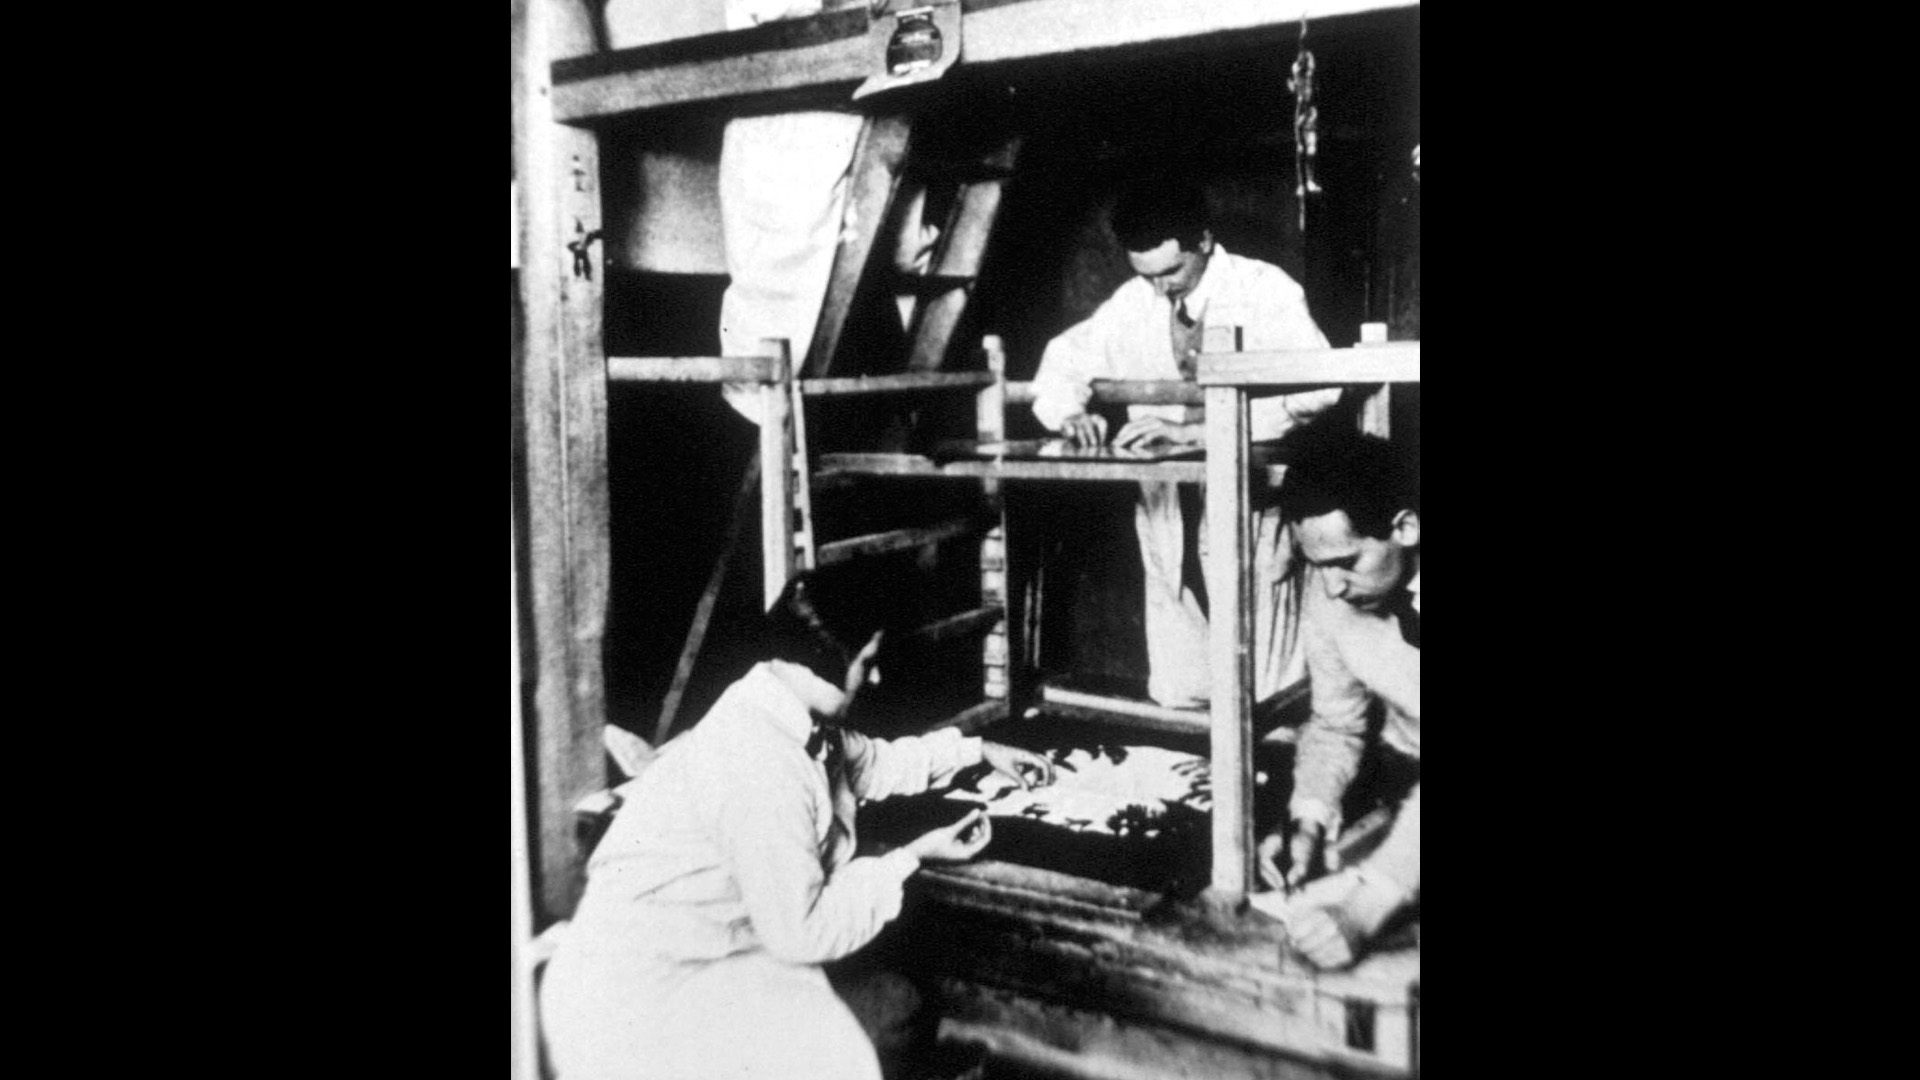 The original multiplane camera